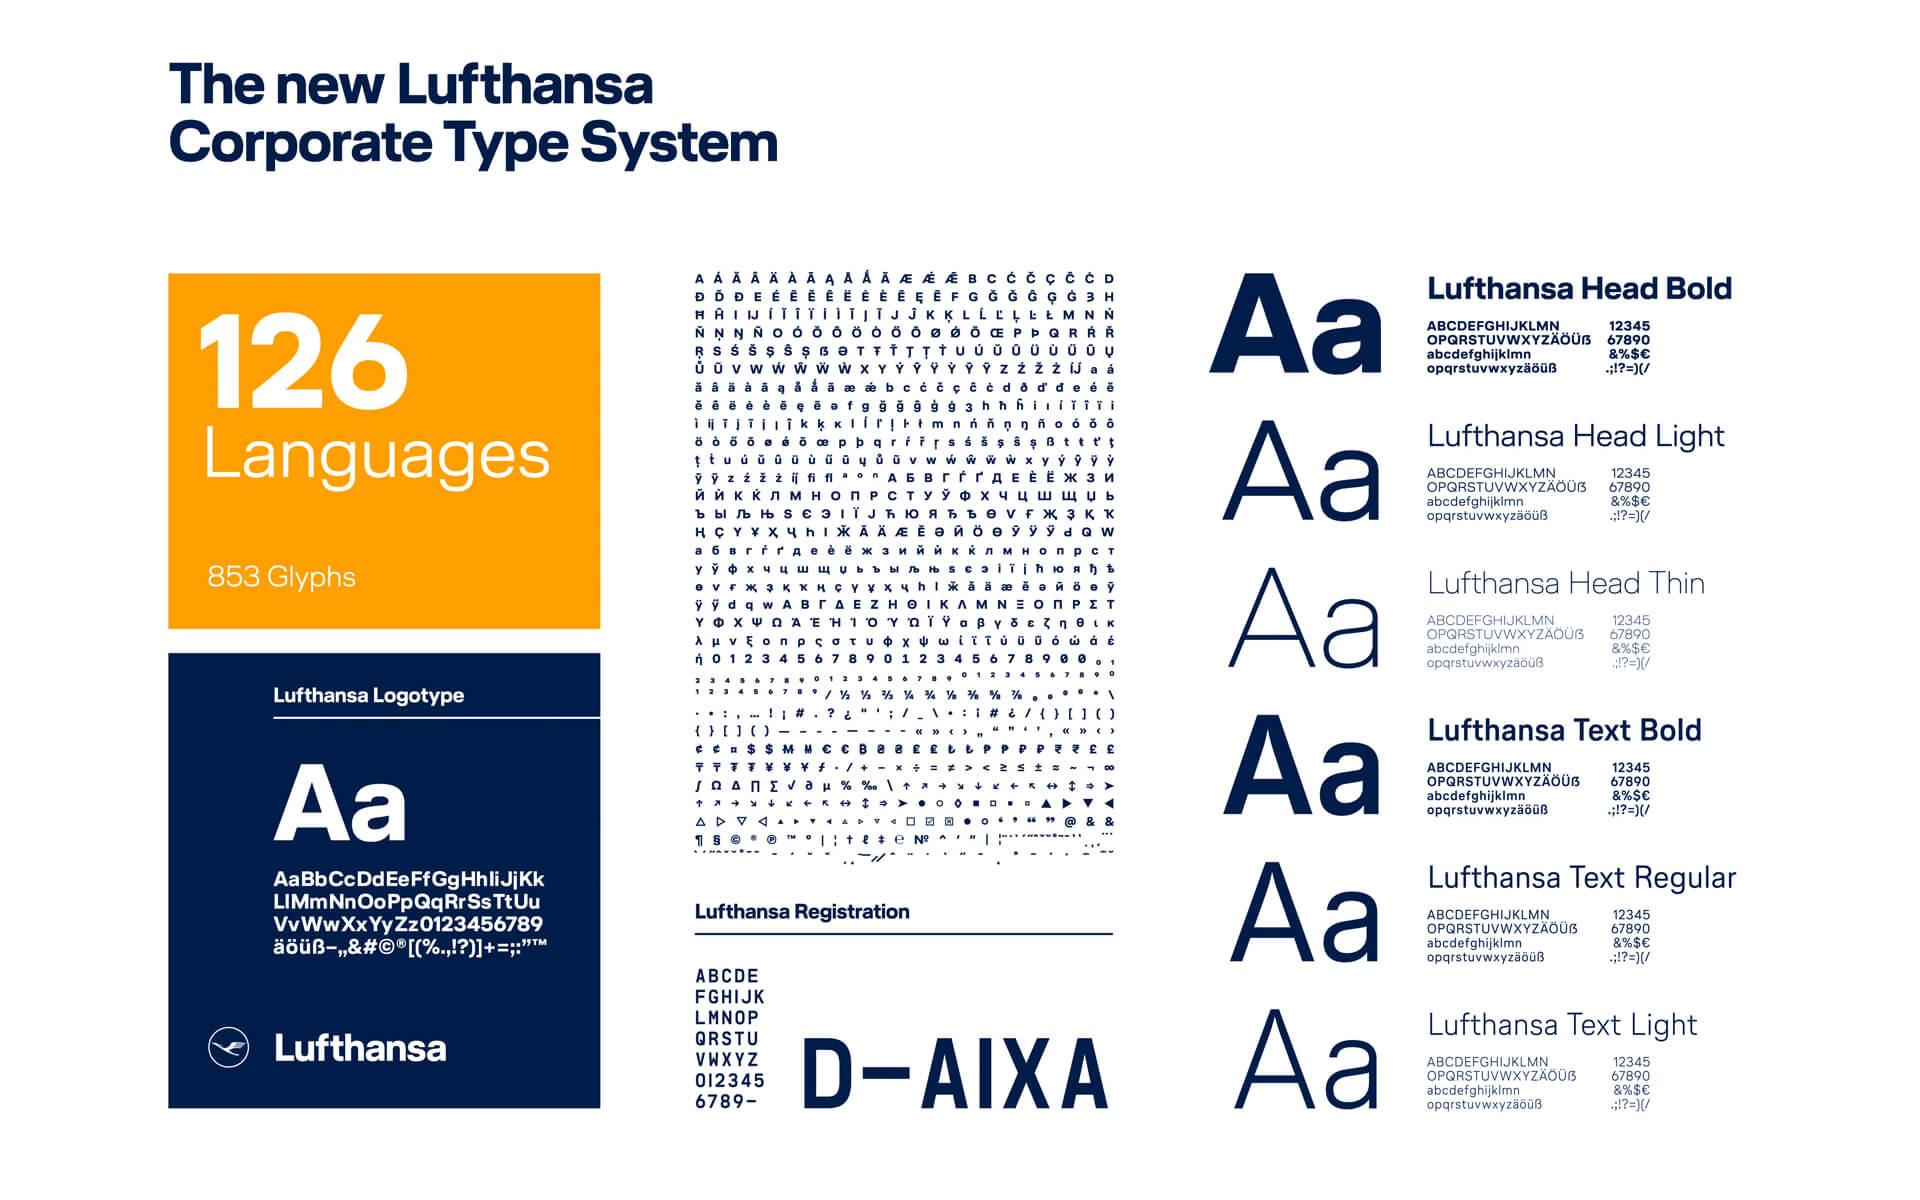 Lufthansa Corporate Design 2018, Redesign, Corporate Typeface